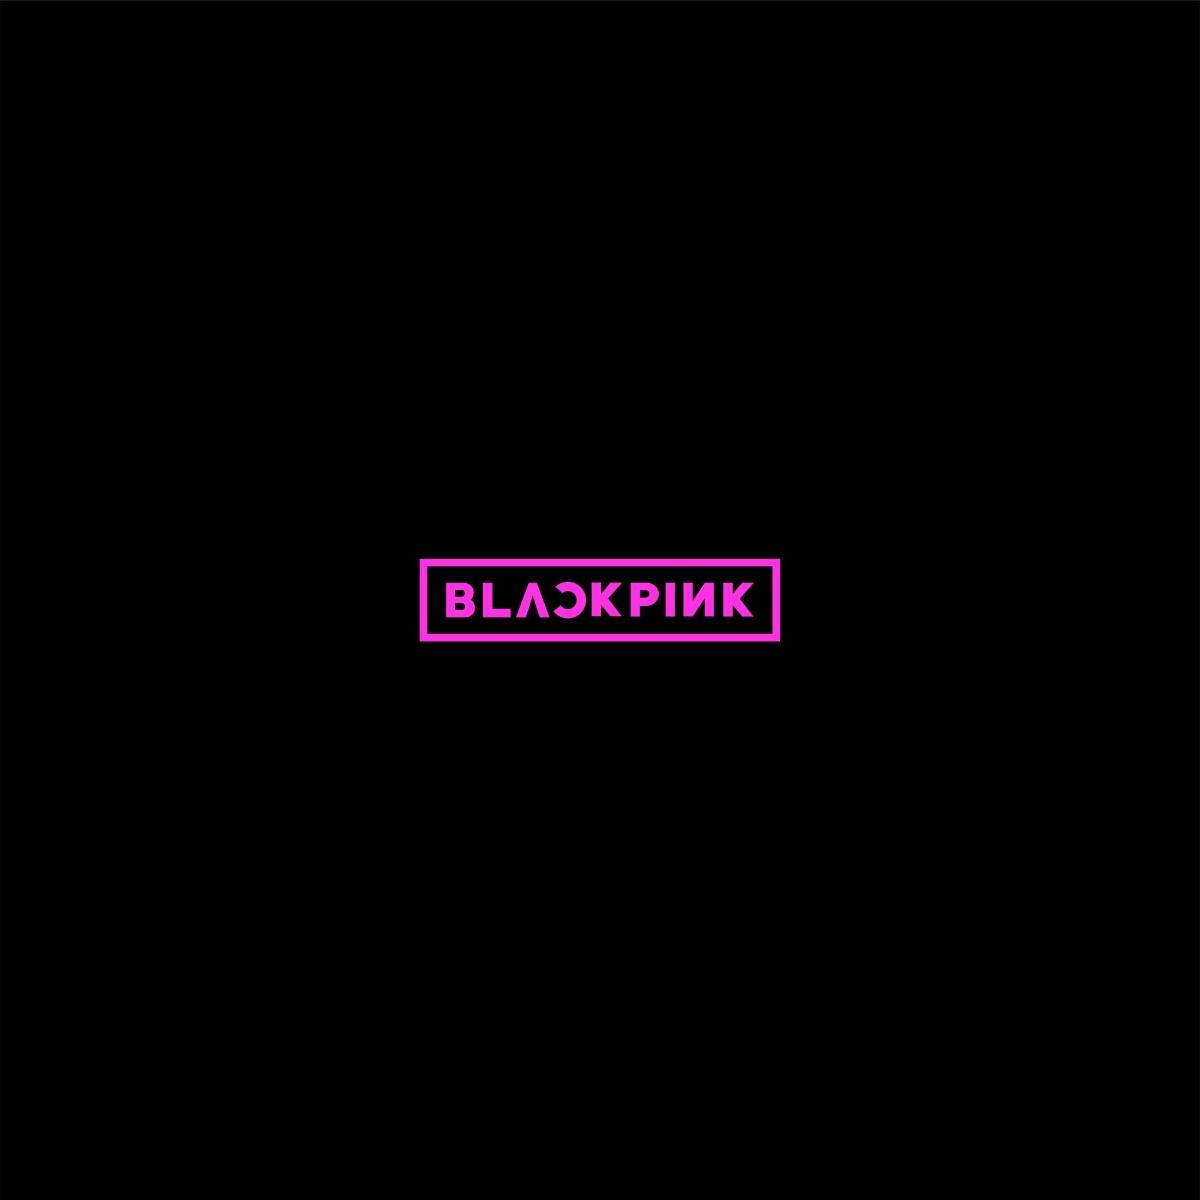 Blackpink Wallpaper Hd For Pc: 楽天ブックス: BLACKPINK (CD+スマプラ)